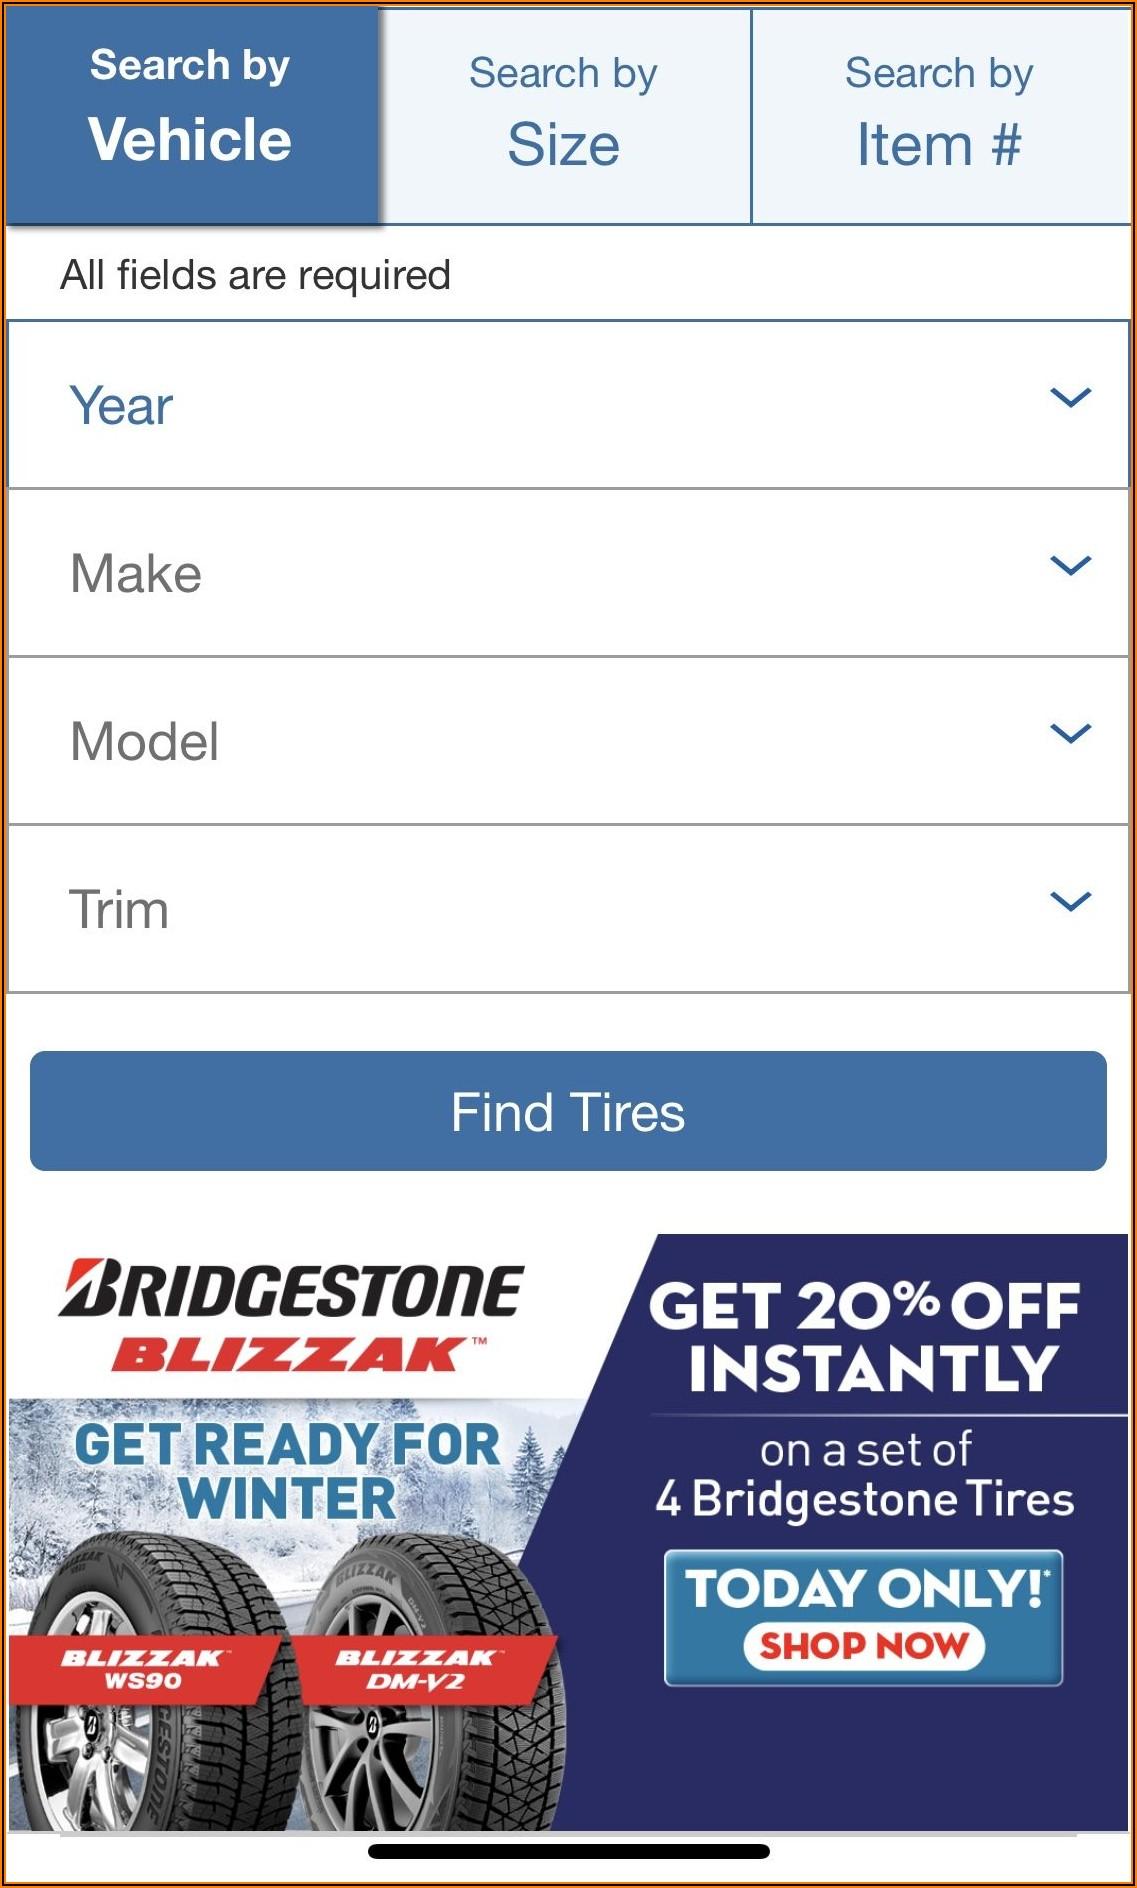 Bridgestone Tire Rebate Form 2019